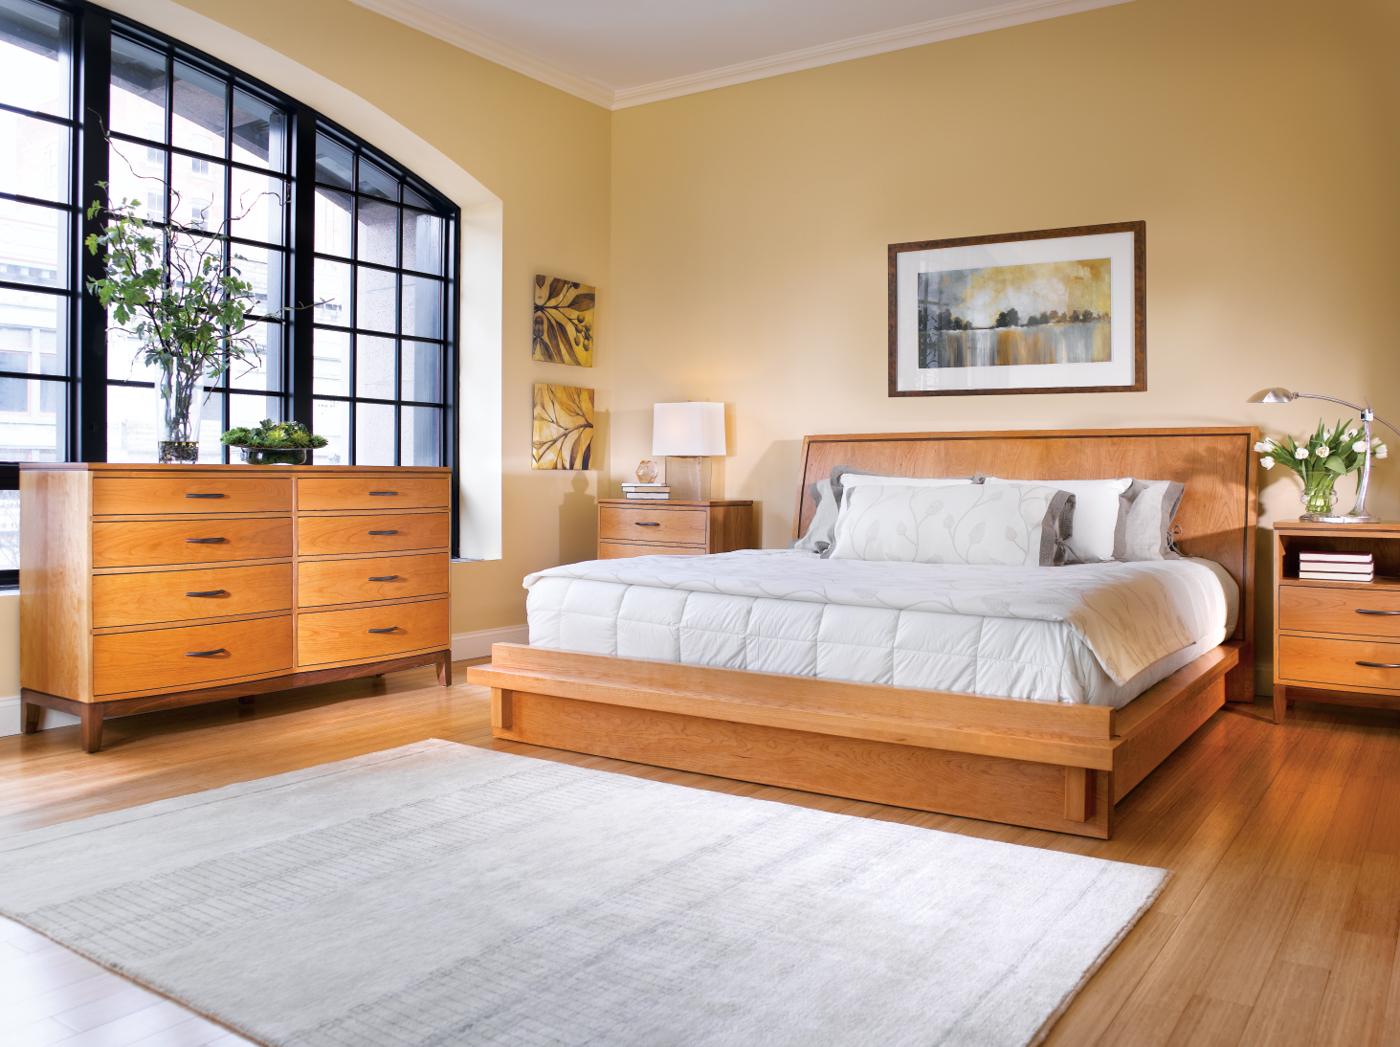 Stickley tribeca platform bed by metropolitan collection for Tribeca homes furniture